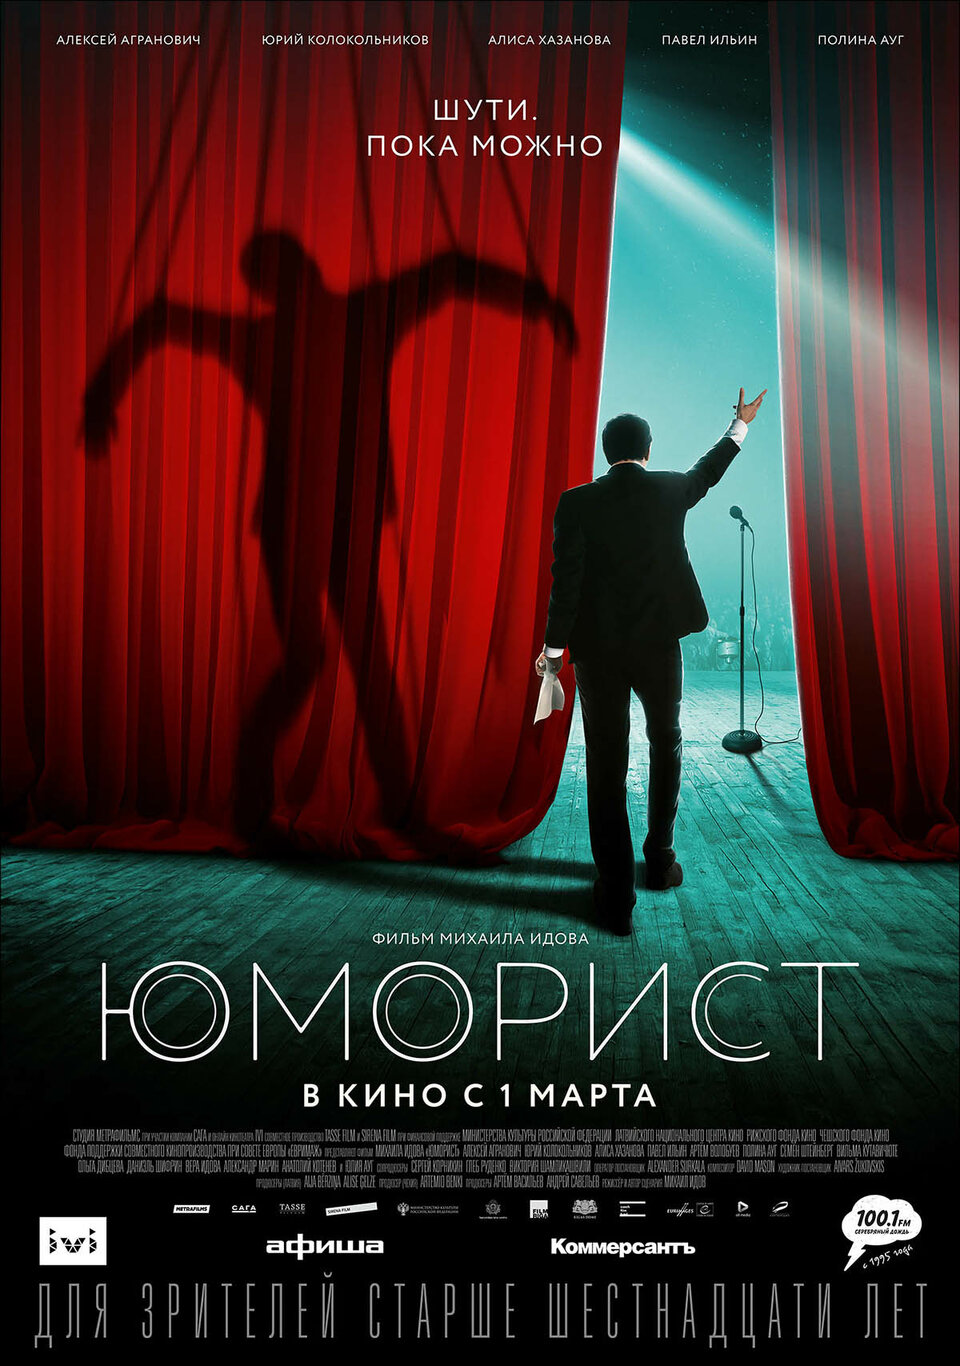 Постер фильма «Юморист»